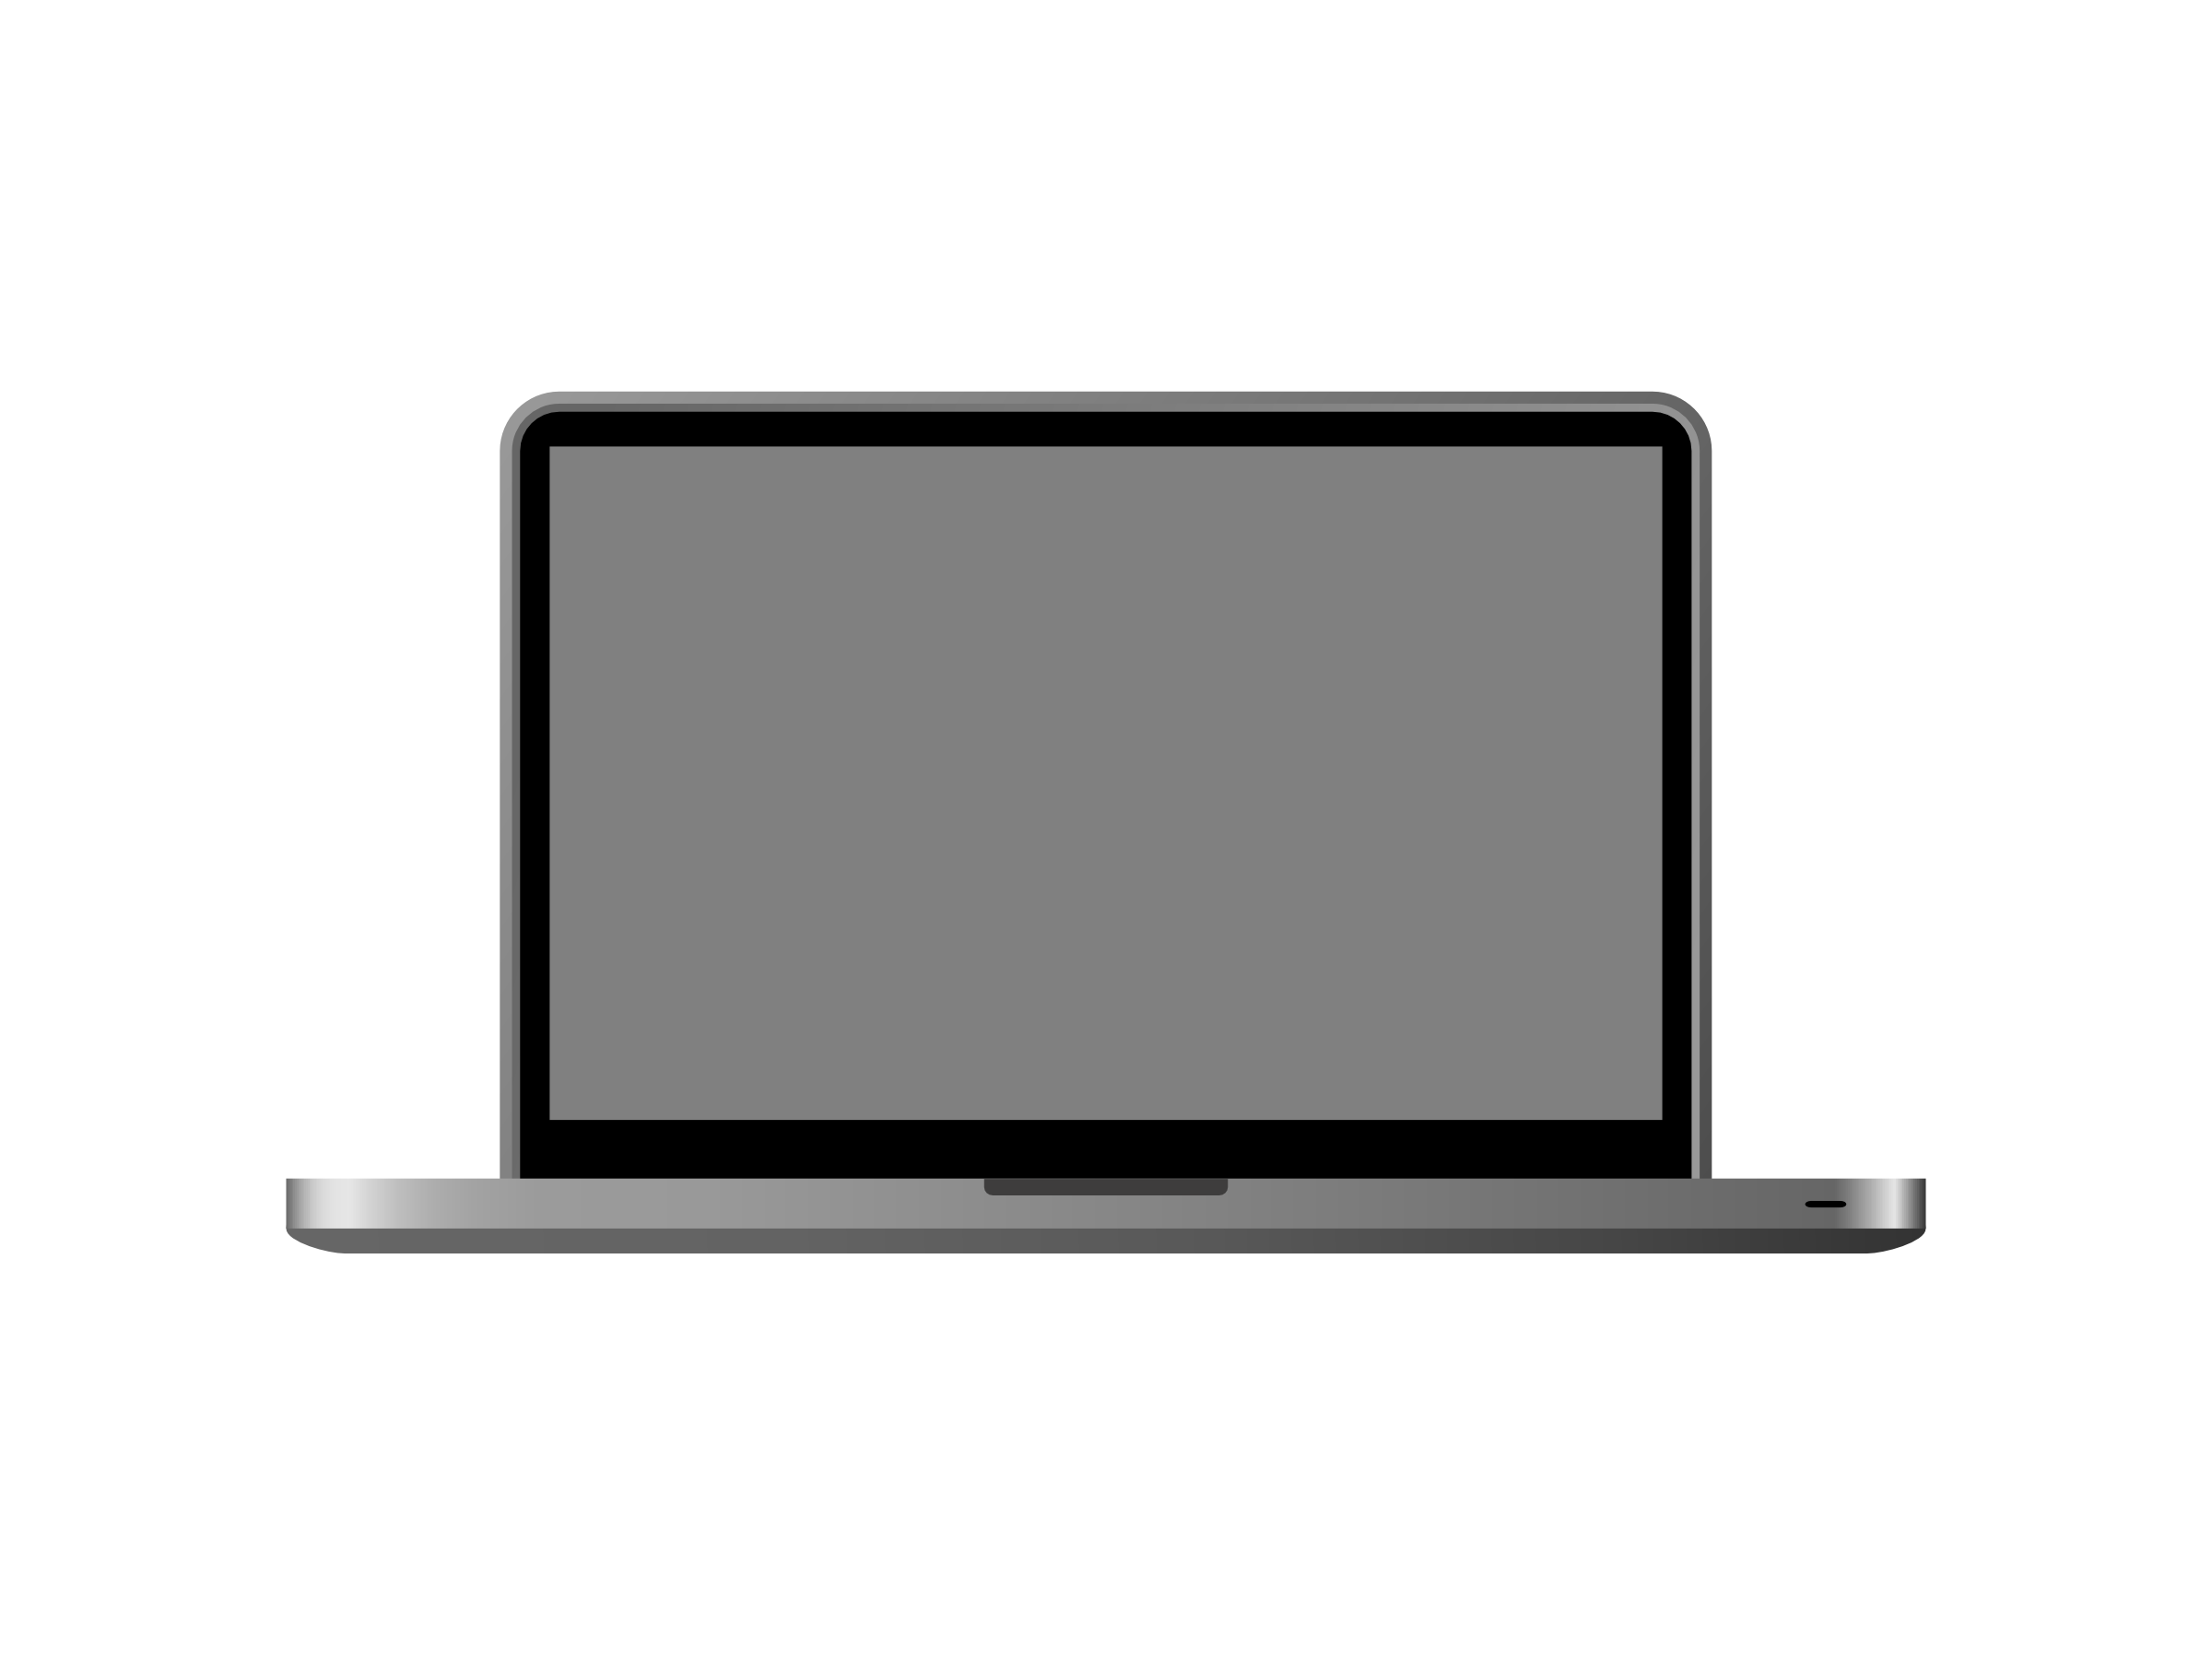 macbook clipart - clipart suggest  clipart